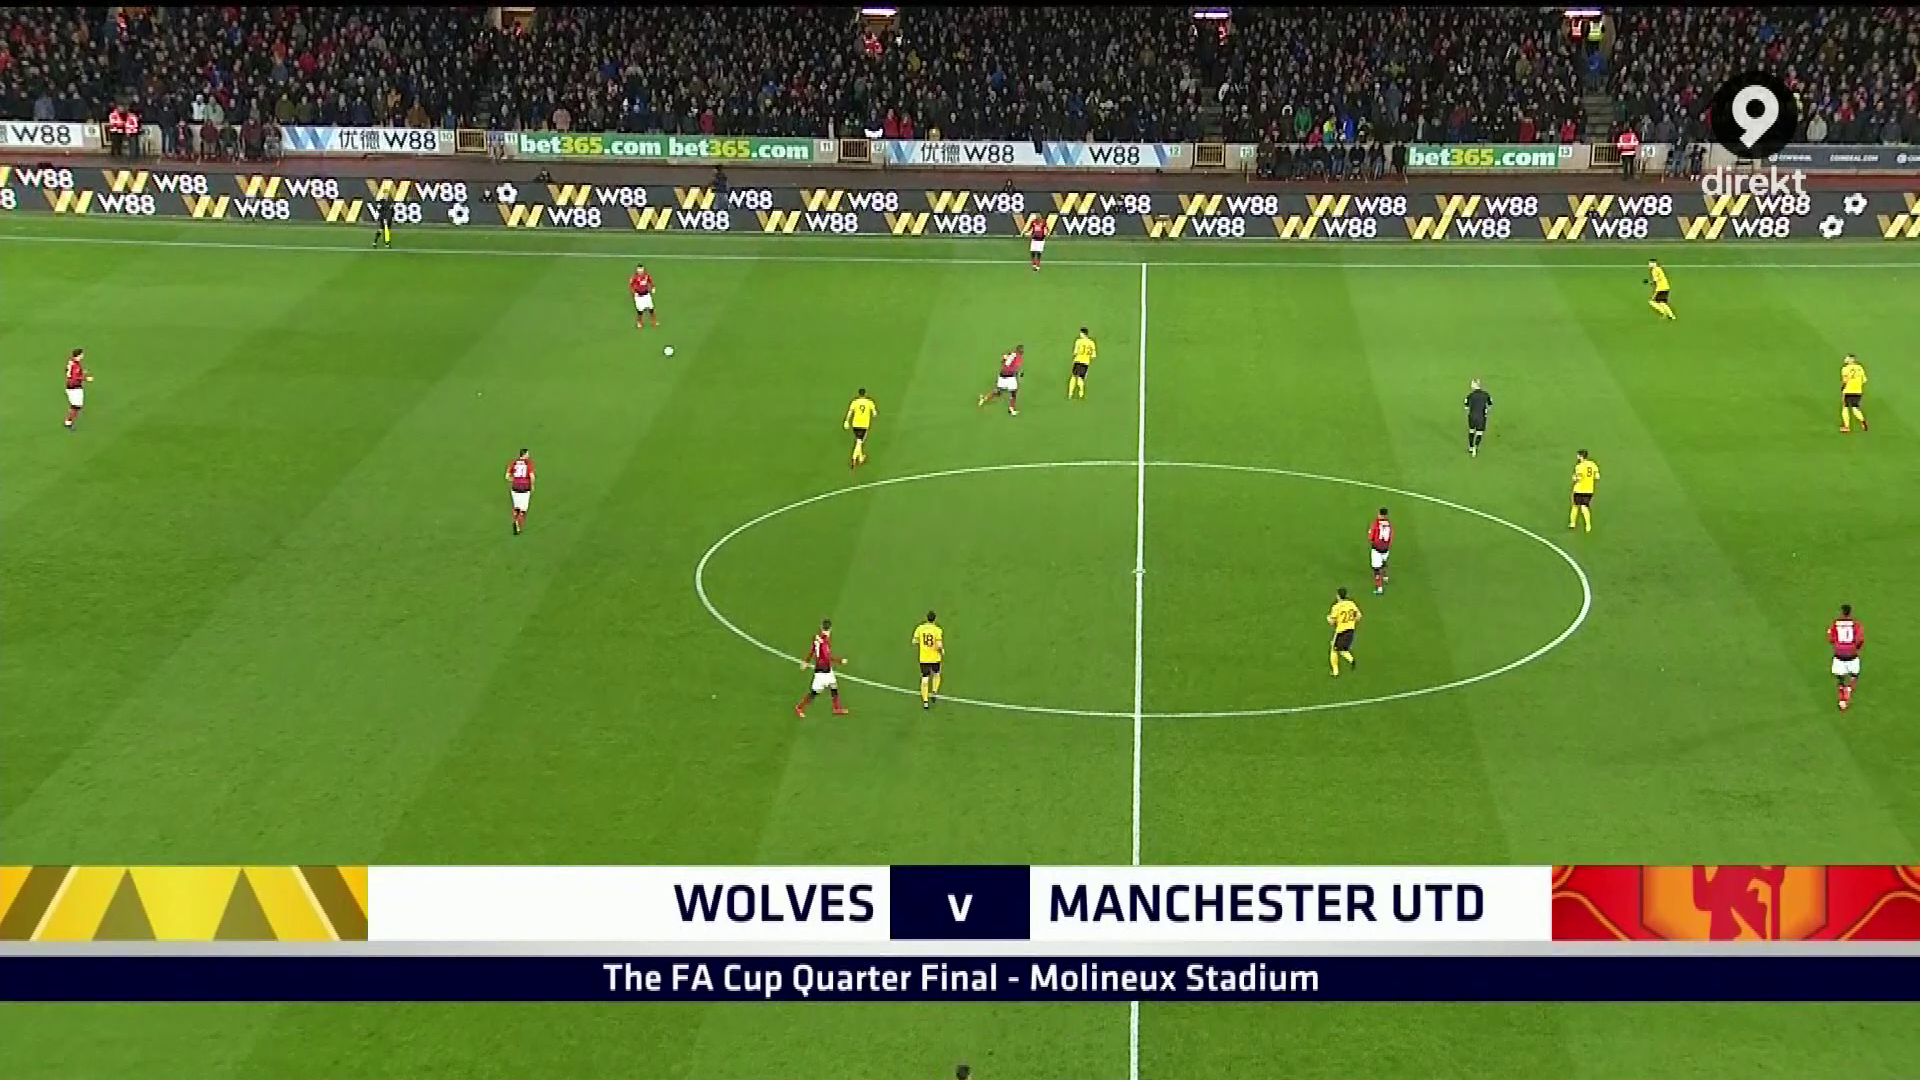 FÚTBOL:FA Cup 18/19 - Quarter Final - Wolverhampton vs